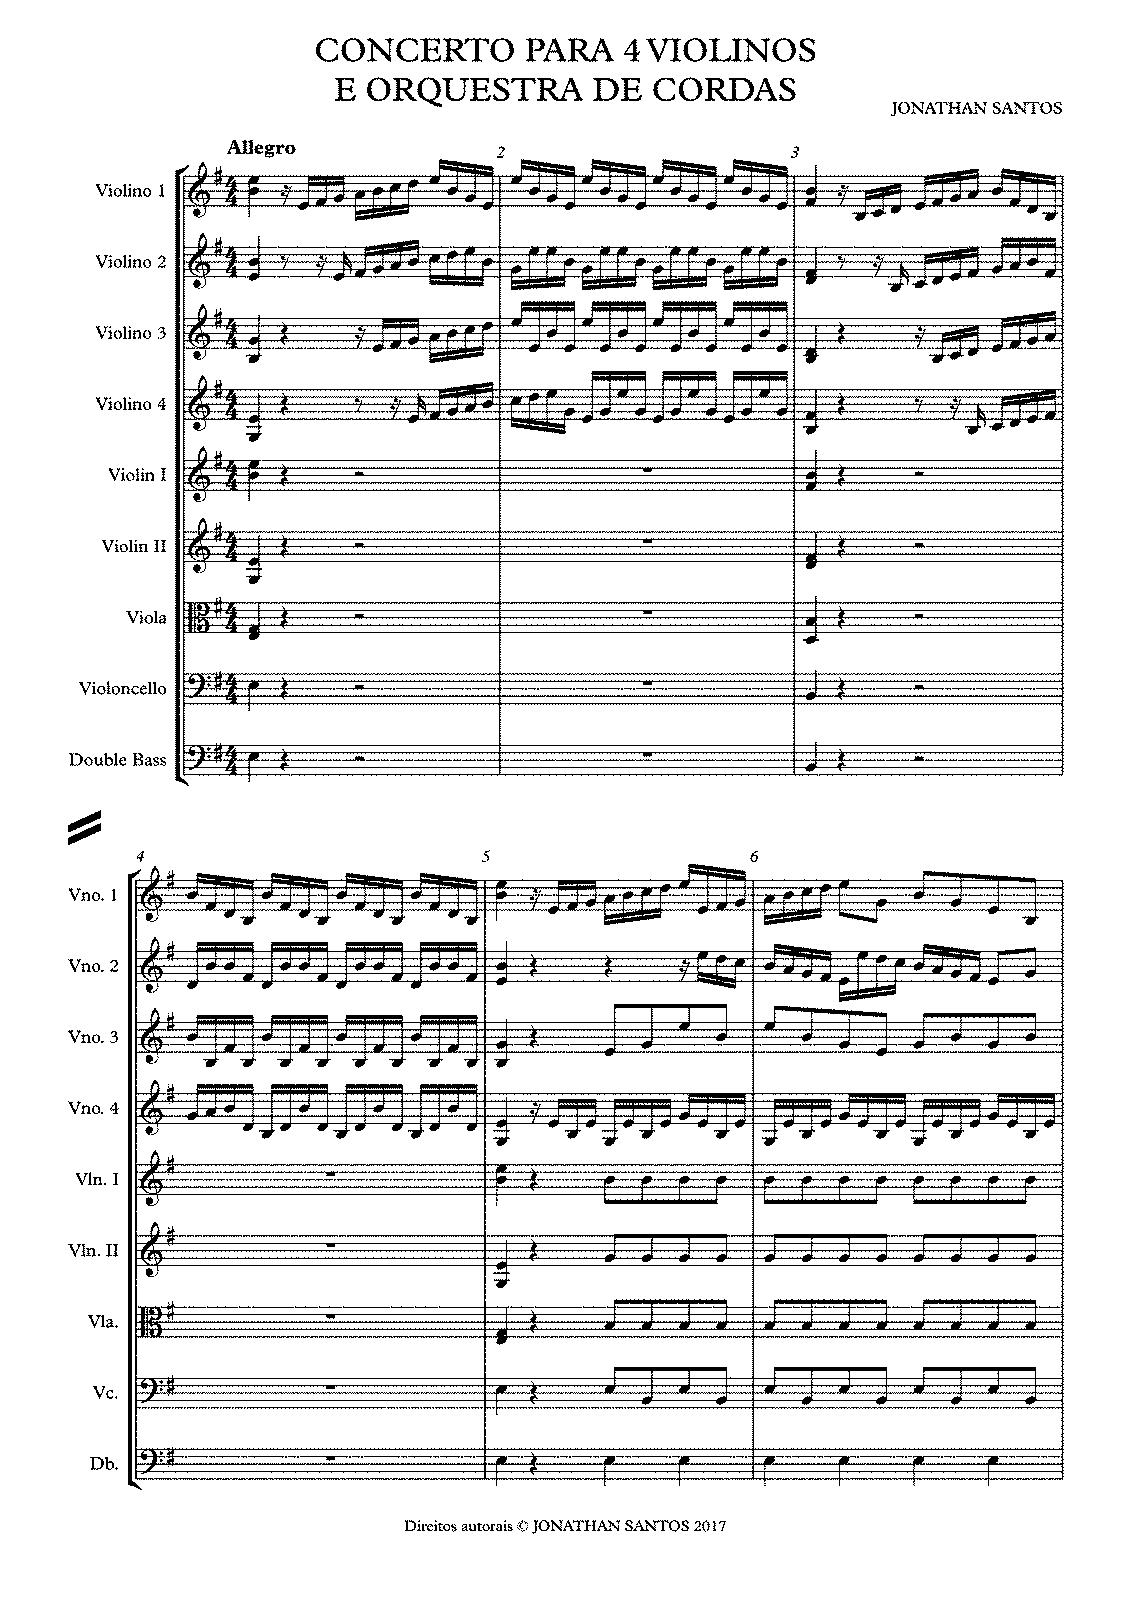 Concerto for 4 Violins, CJS 1 (Santos, Jonathan) - IMSLP/Petrucci